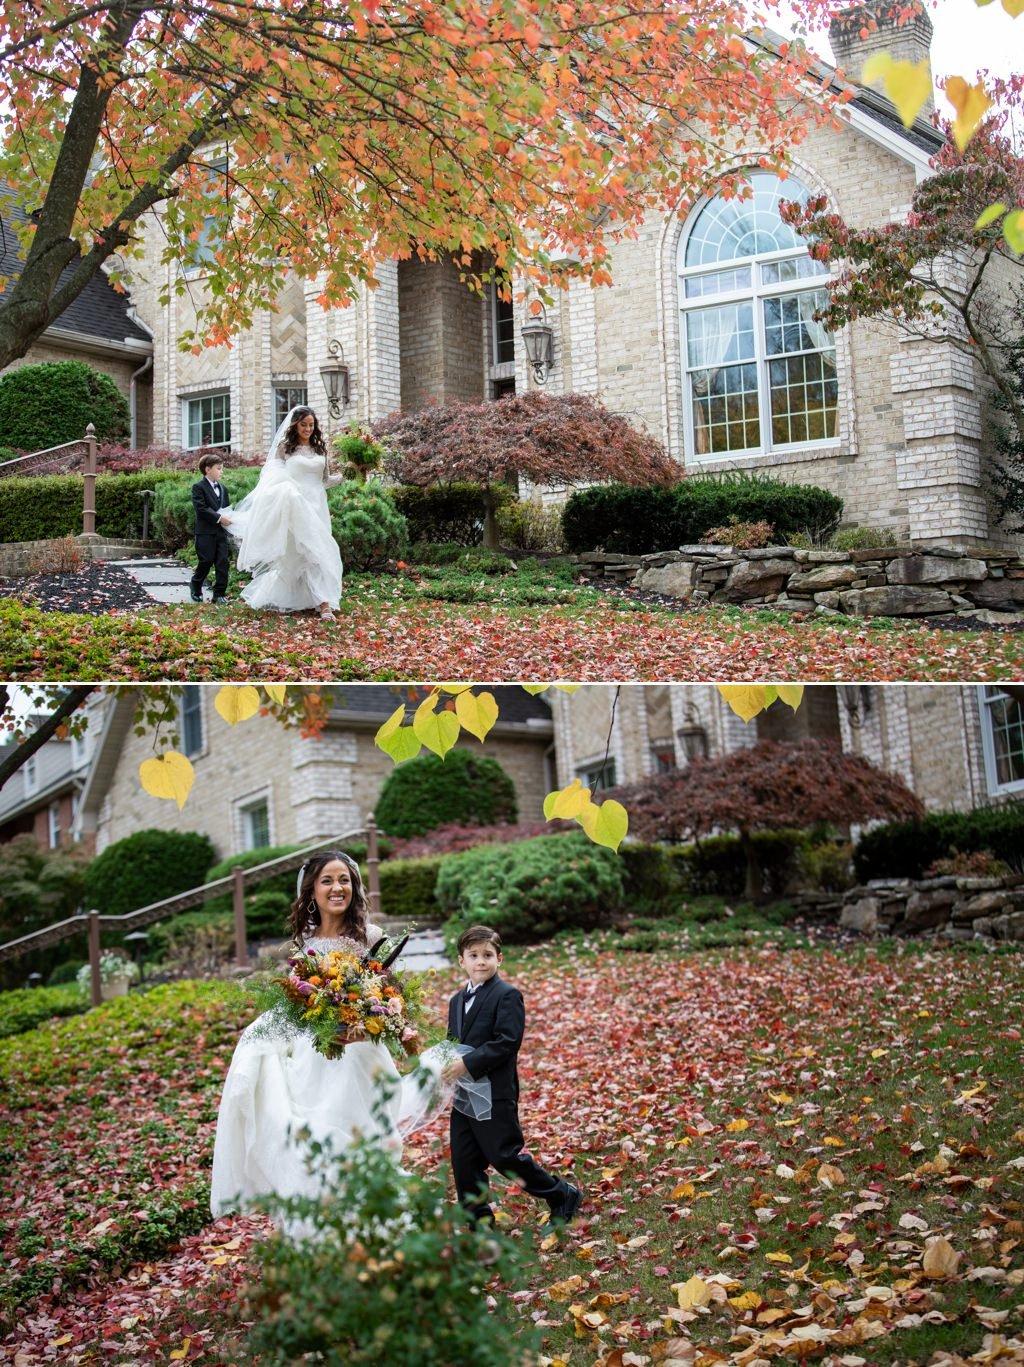 A ring bearer carrying the bride's wedding dress veil